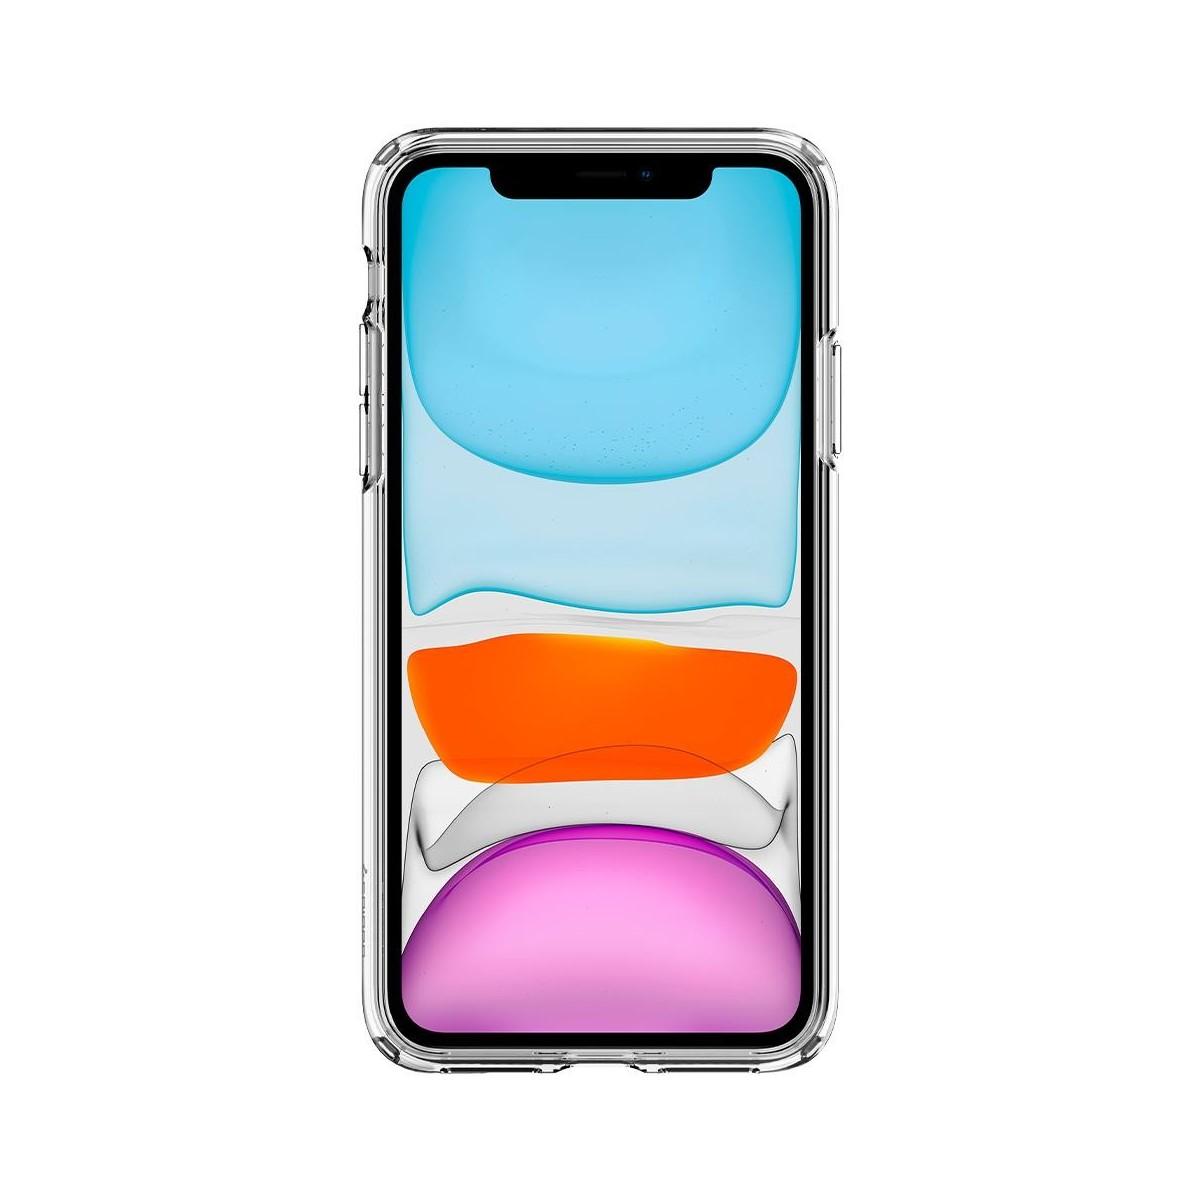 Coque compatible iPhone 11 Liquid Crystal transparente - Spigen